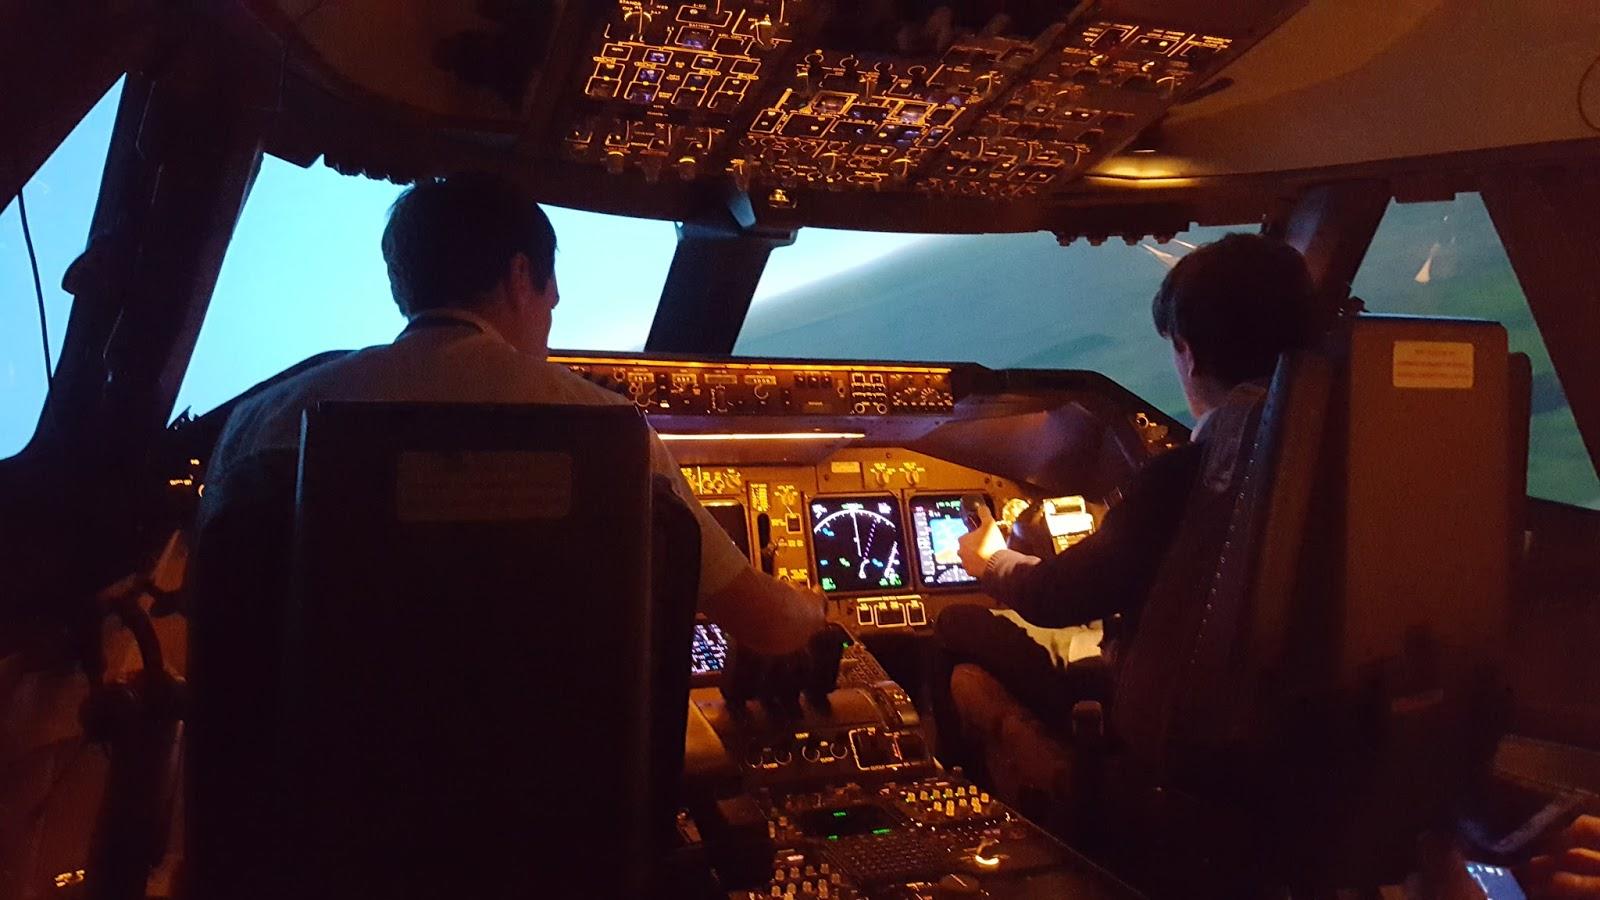 aeroBILITY blog: Julian's British Airways Simulator Experience